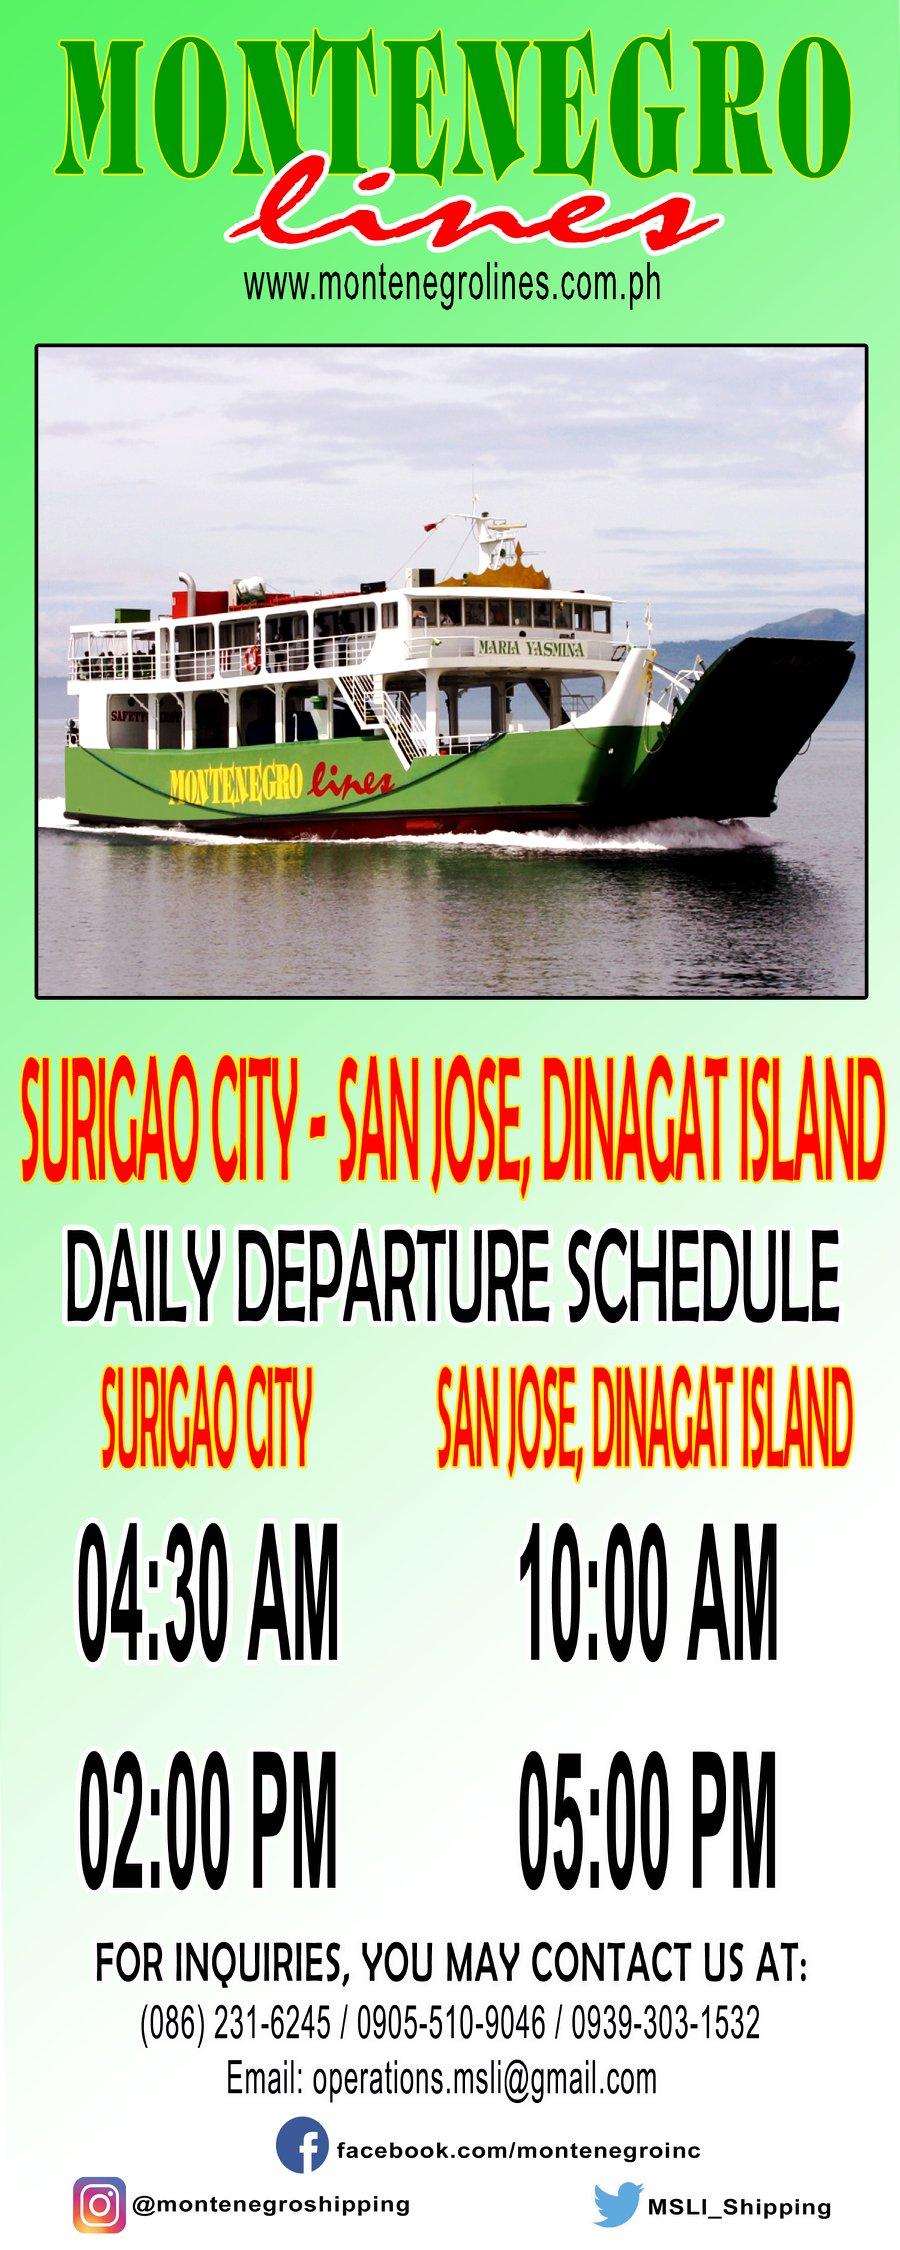 Montenegro Lines Surigao City-San Jose, Dinagat Island Ferry Schedule